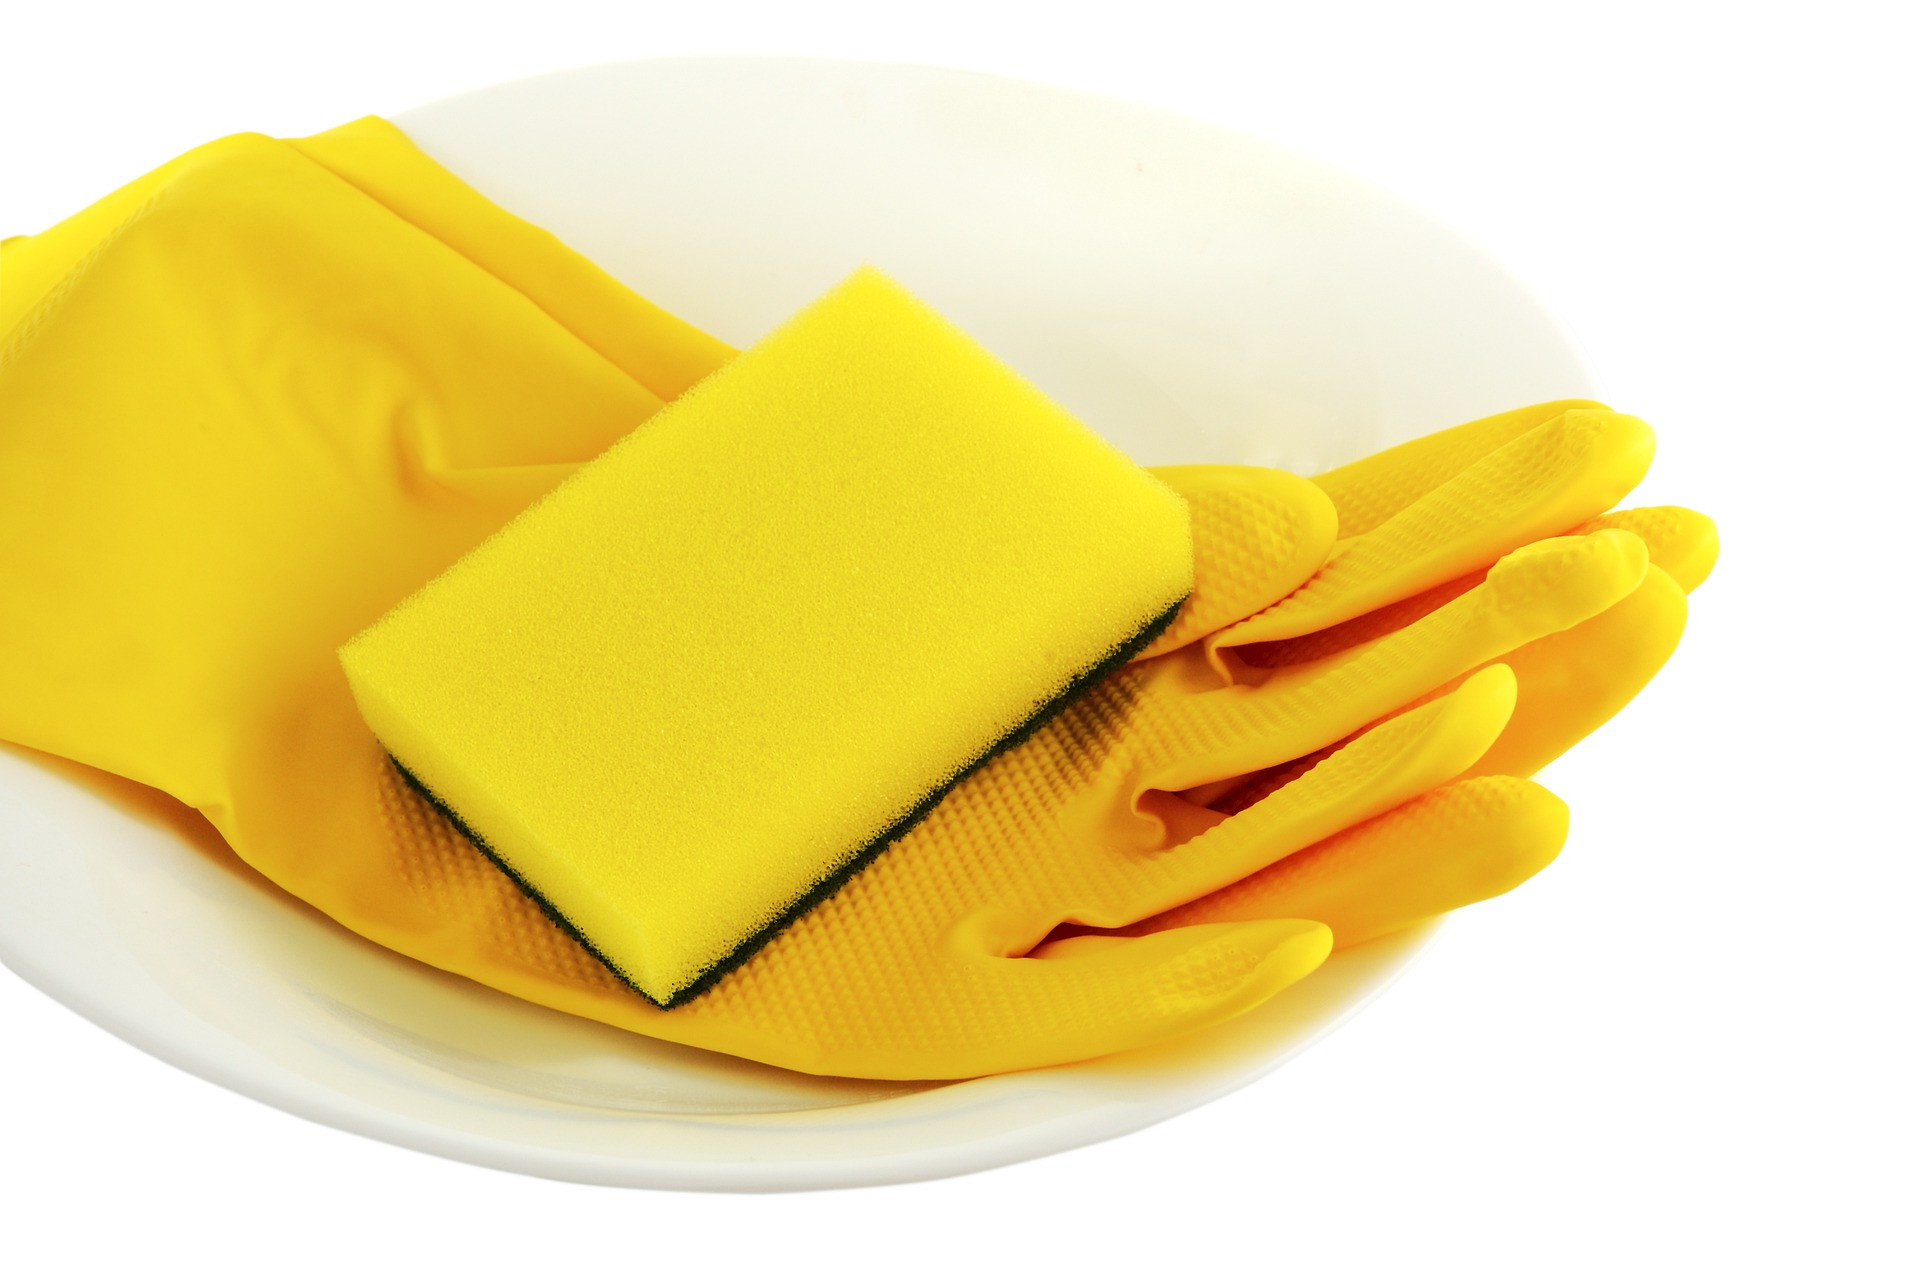 Nettoyer la maison après grippe, gastro, coronavirus…